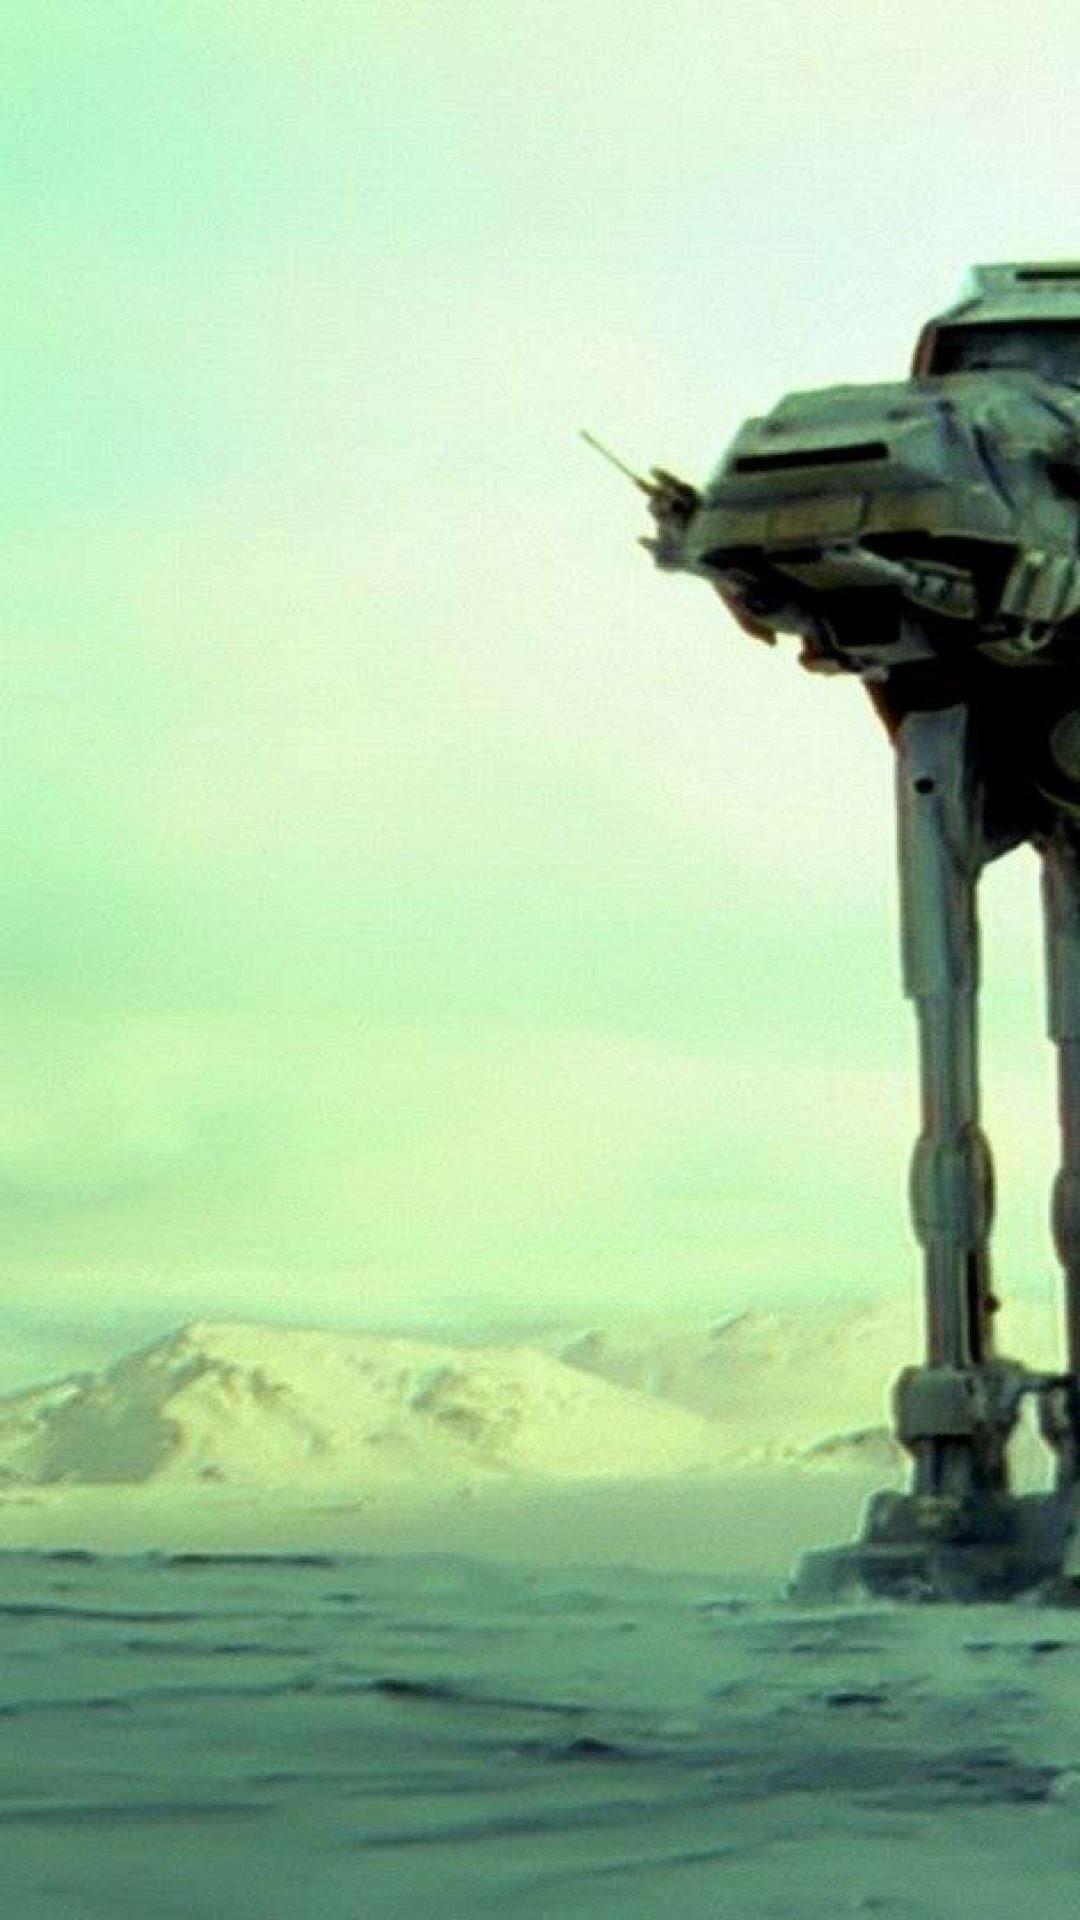 star wars wallpaper hd 1080p 71 images